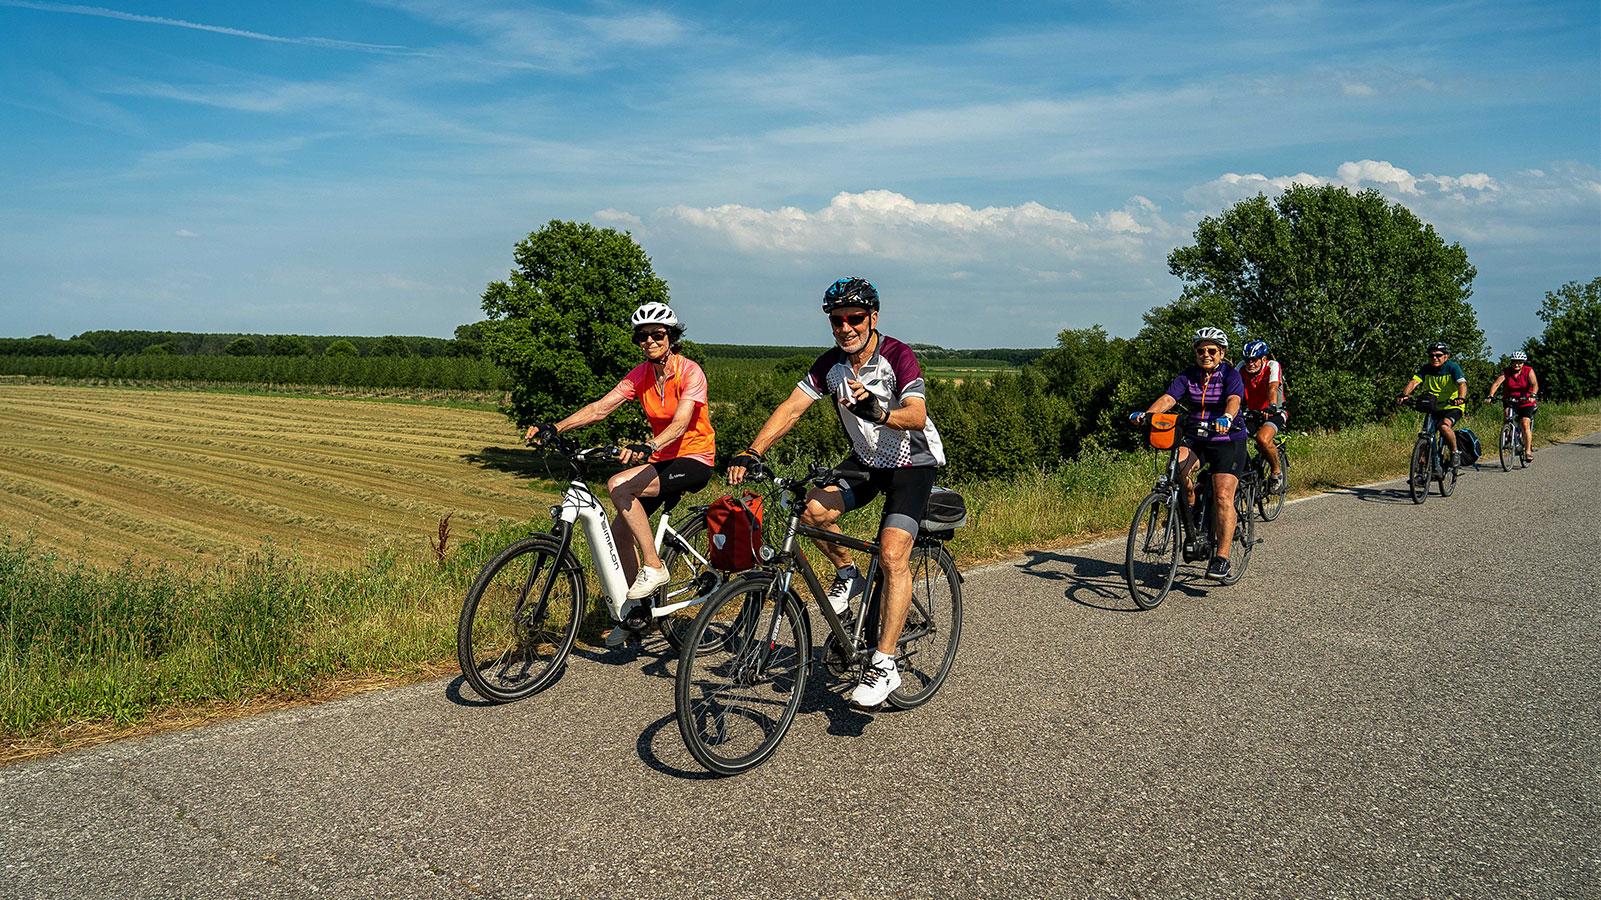 Ciclofestival dei Parchi 2021